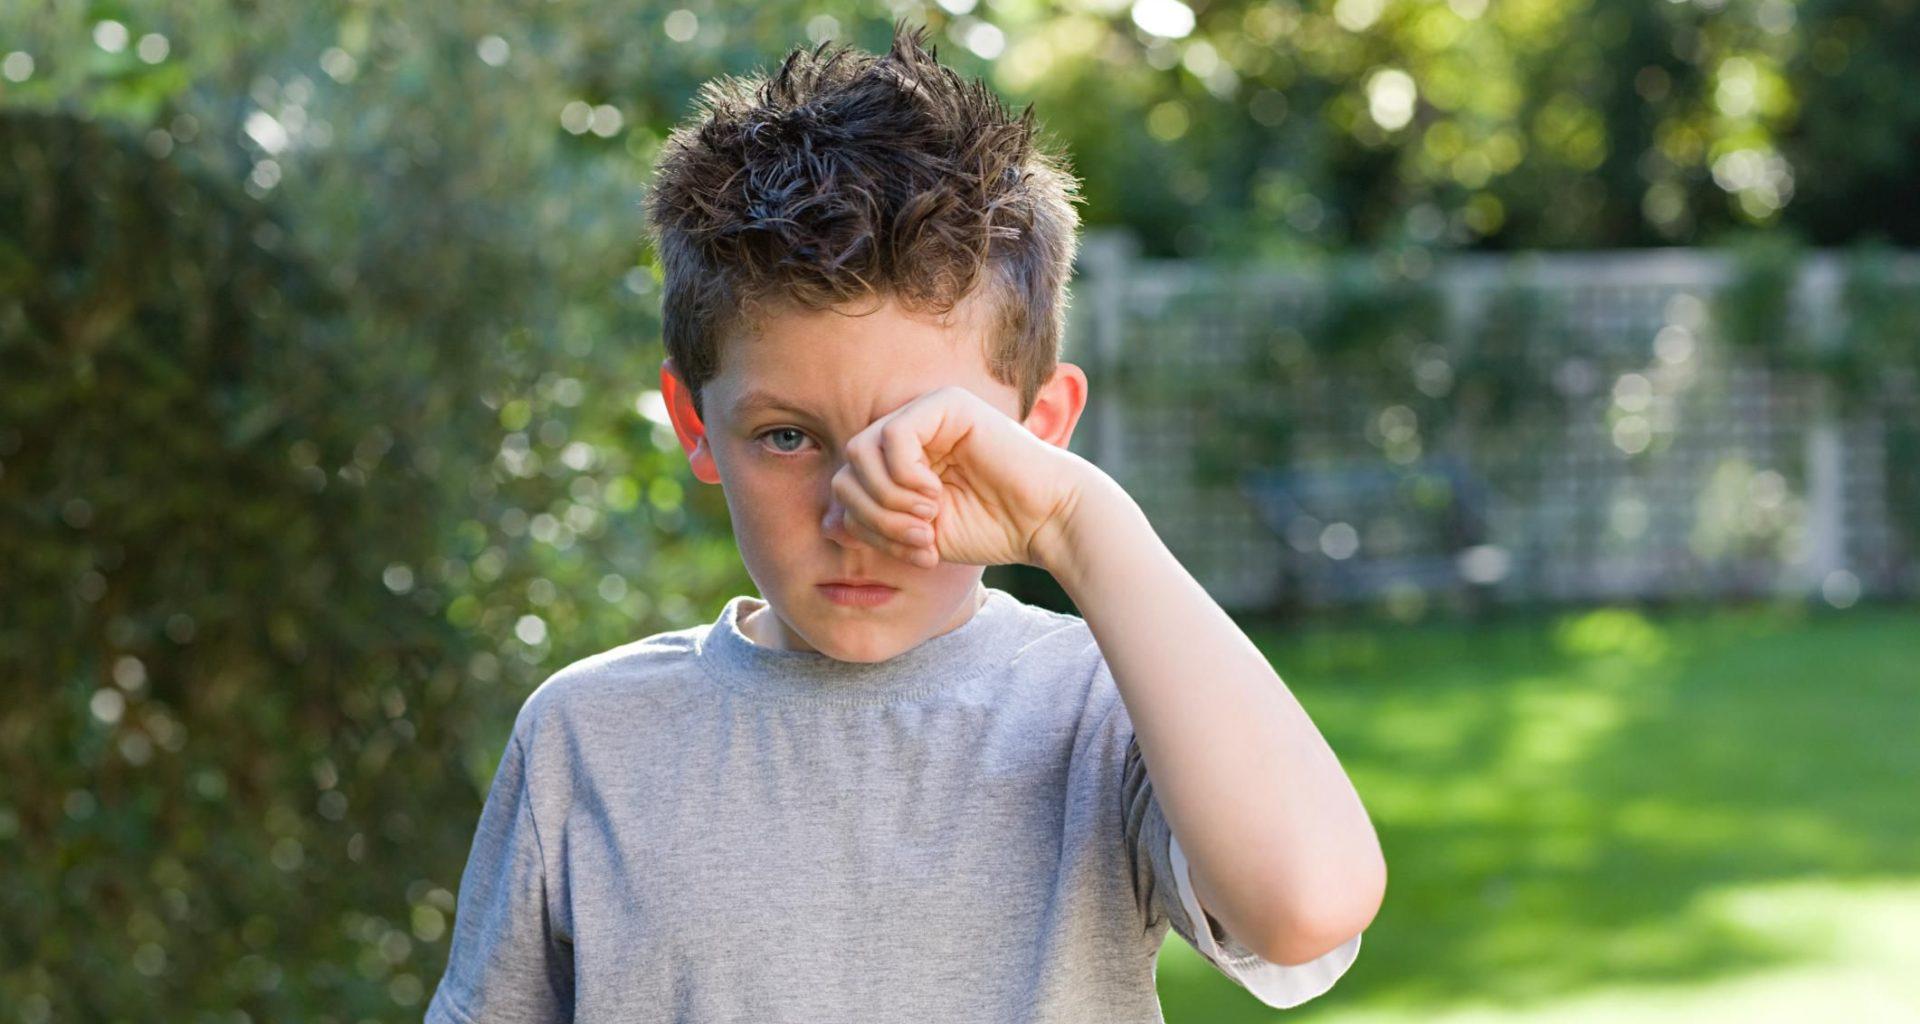 конюнктивит у ребенка